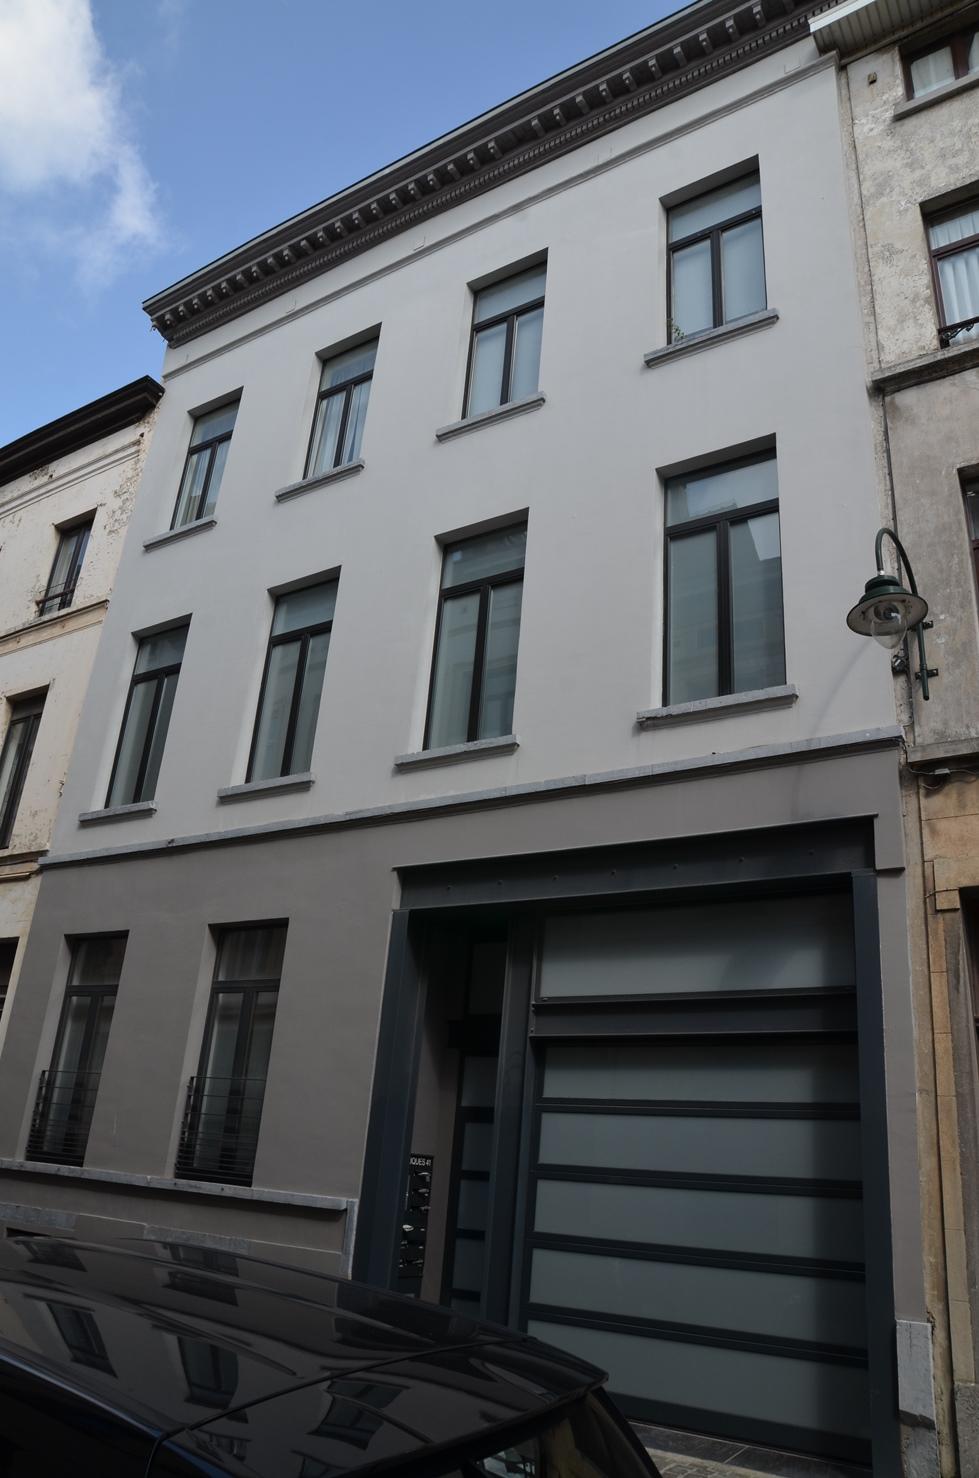 Rue des Fabriques 41, 2015